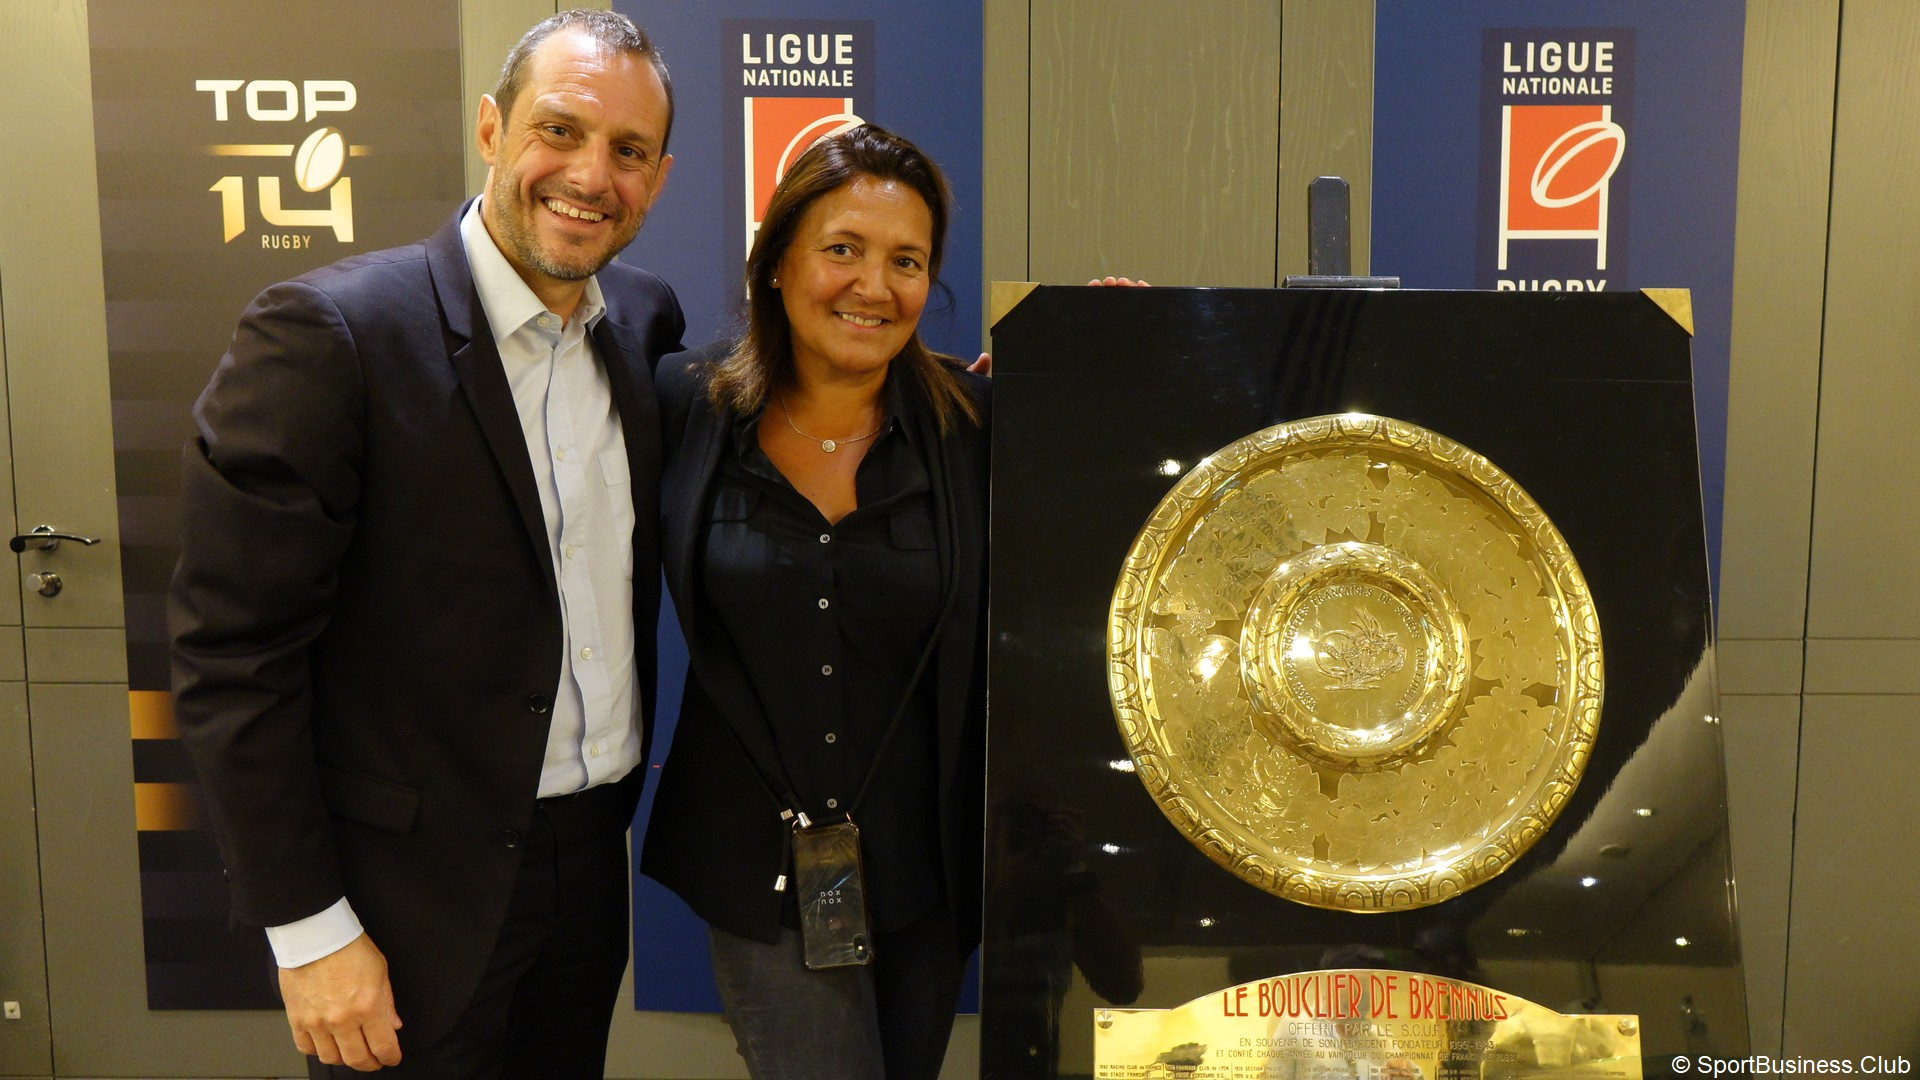 GMF Marie Jo Ninine x Thibaut Chatelard LNR (rugby)